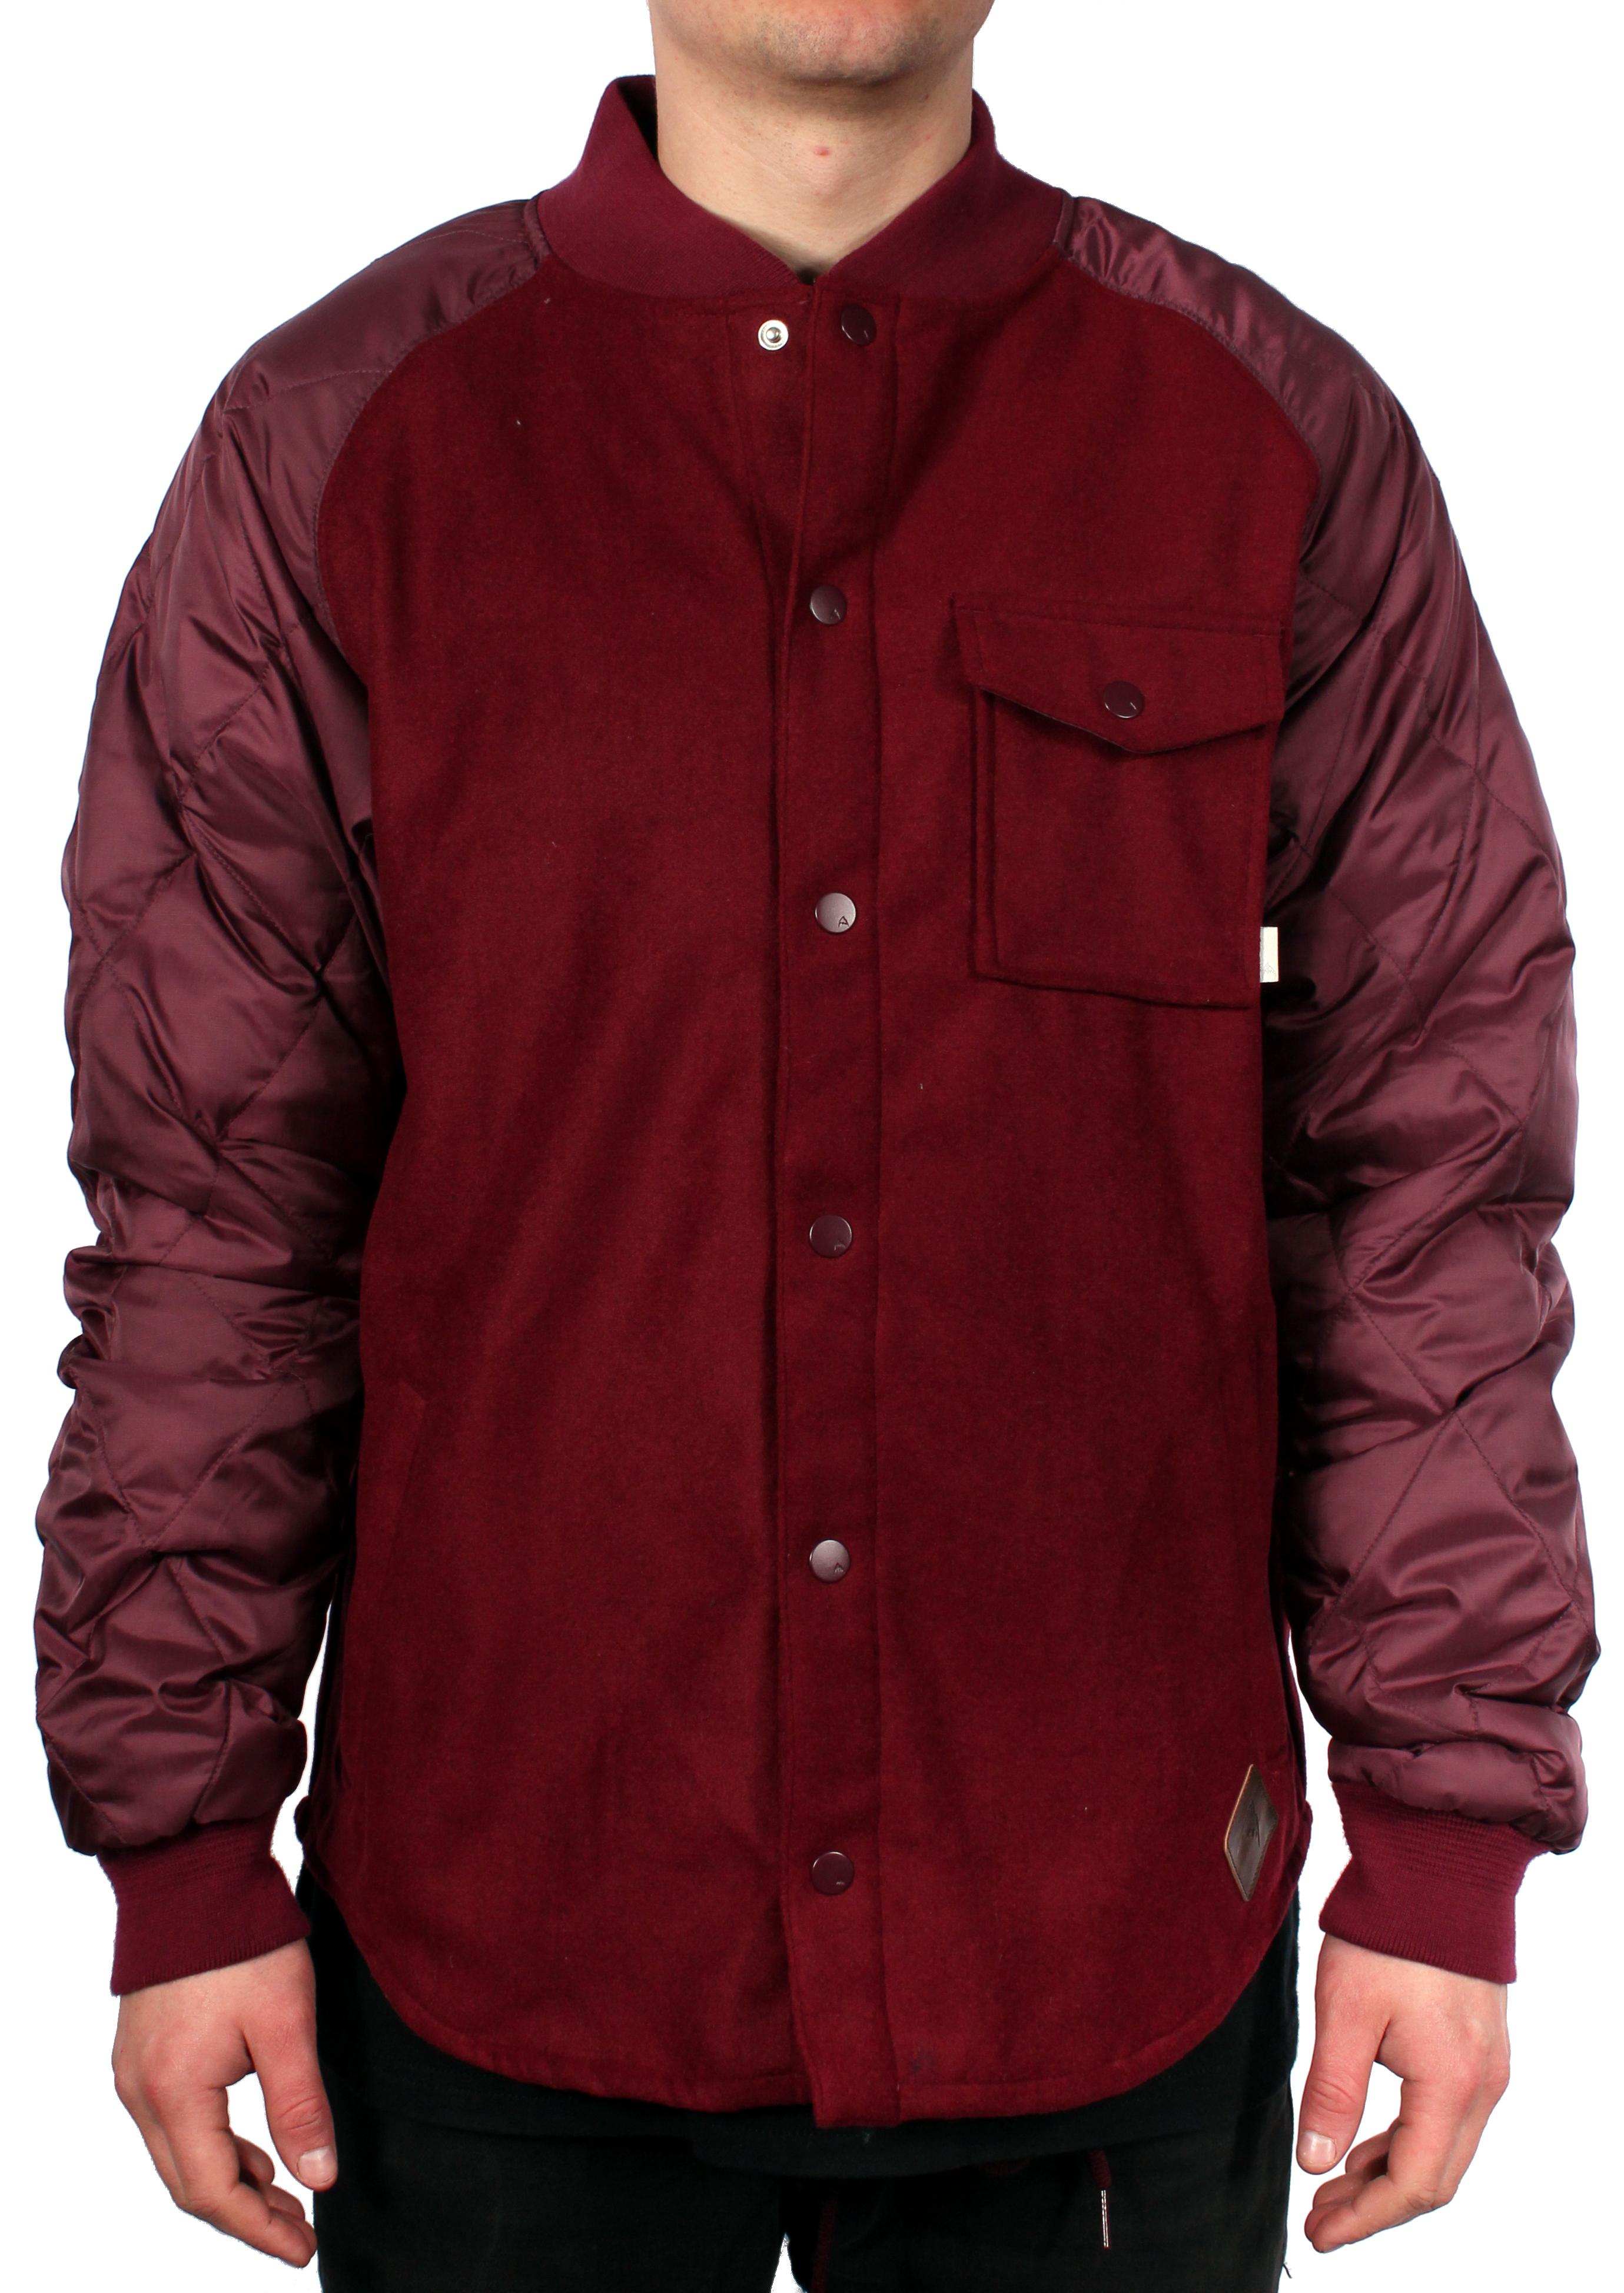 Bluza Ocieplana Burton Ackley Flannel (Sangria)